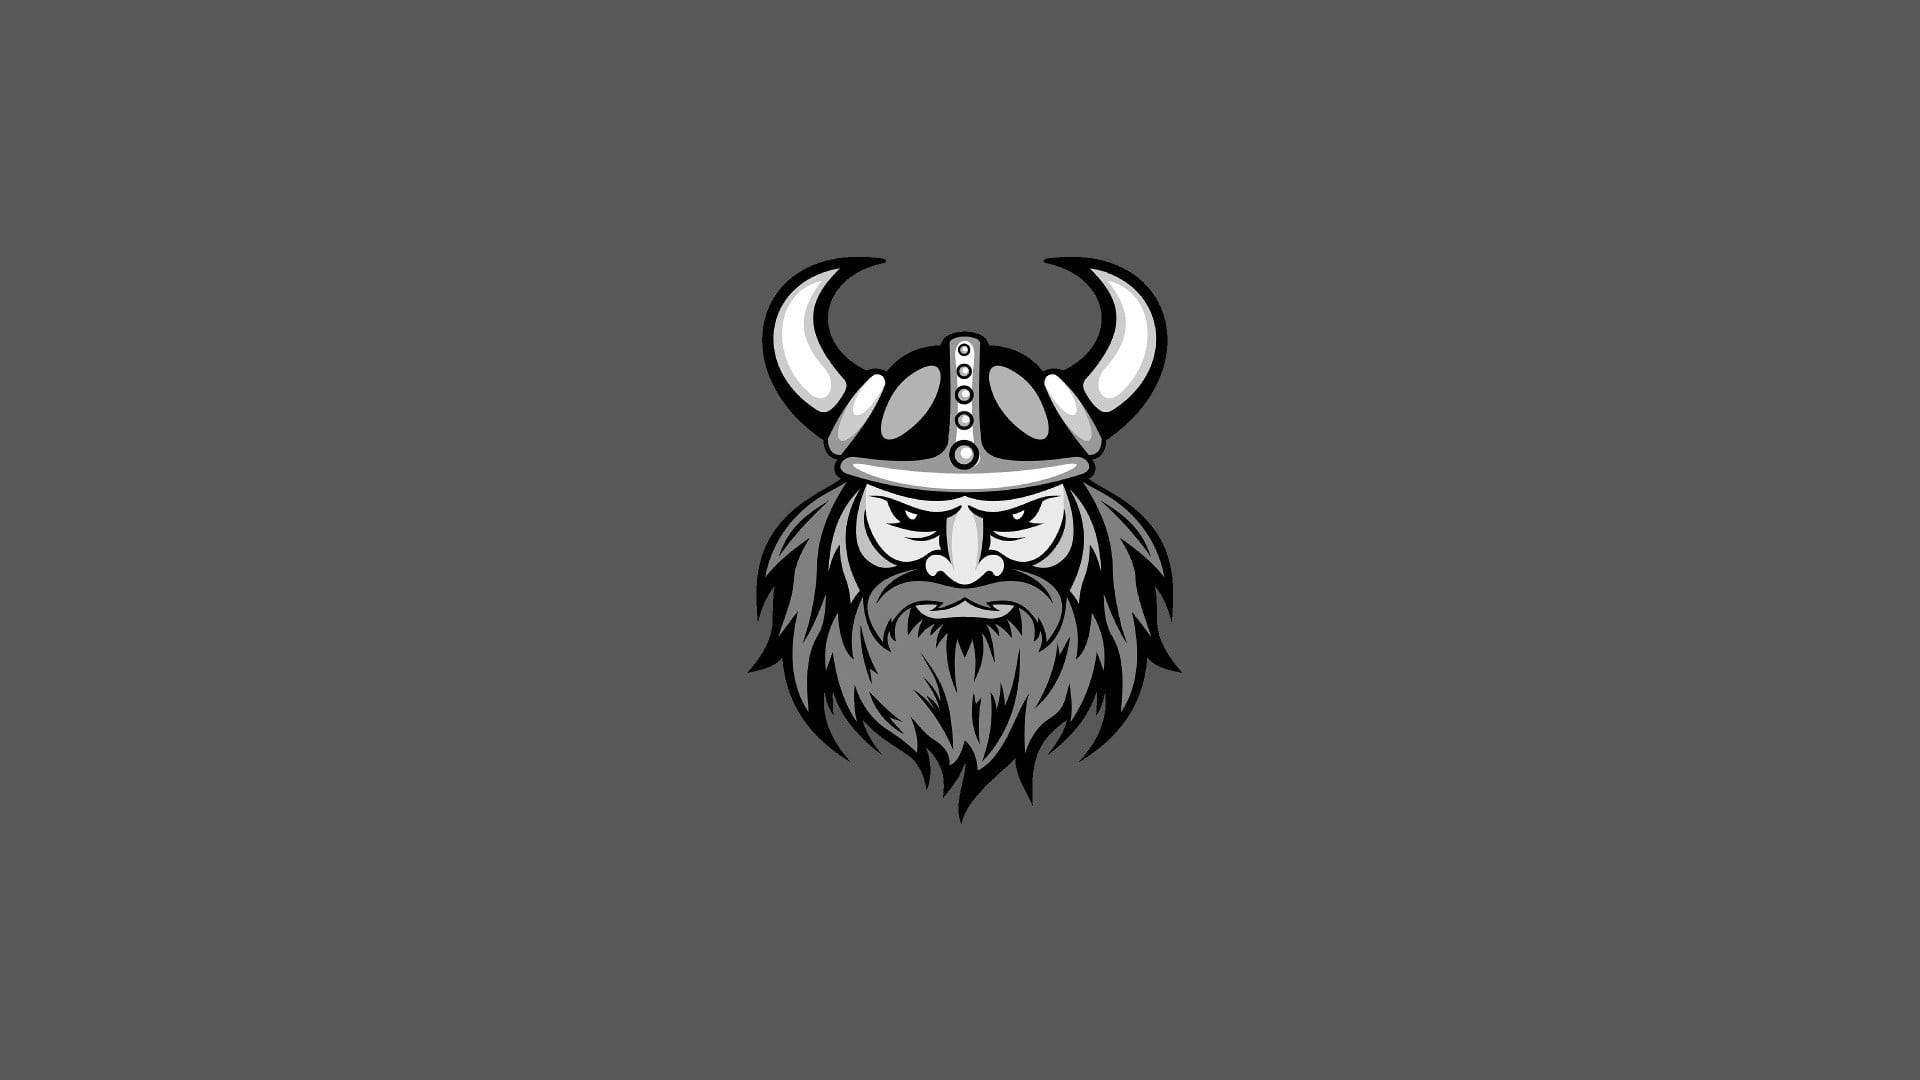 Res: 1920x1080, Minnesota Vikings logo, minimalism, vector, no people, studio shot